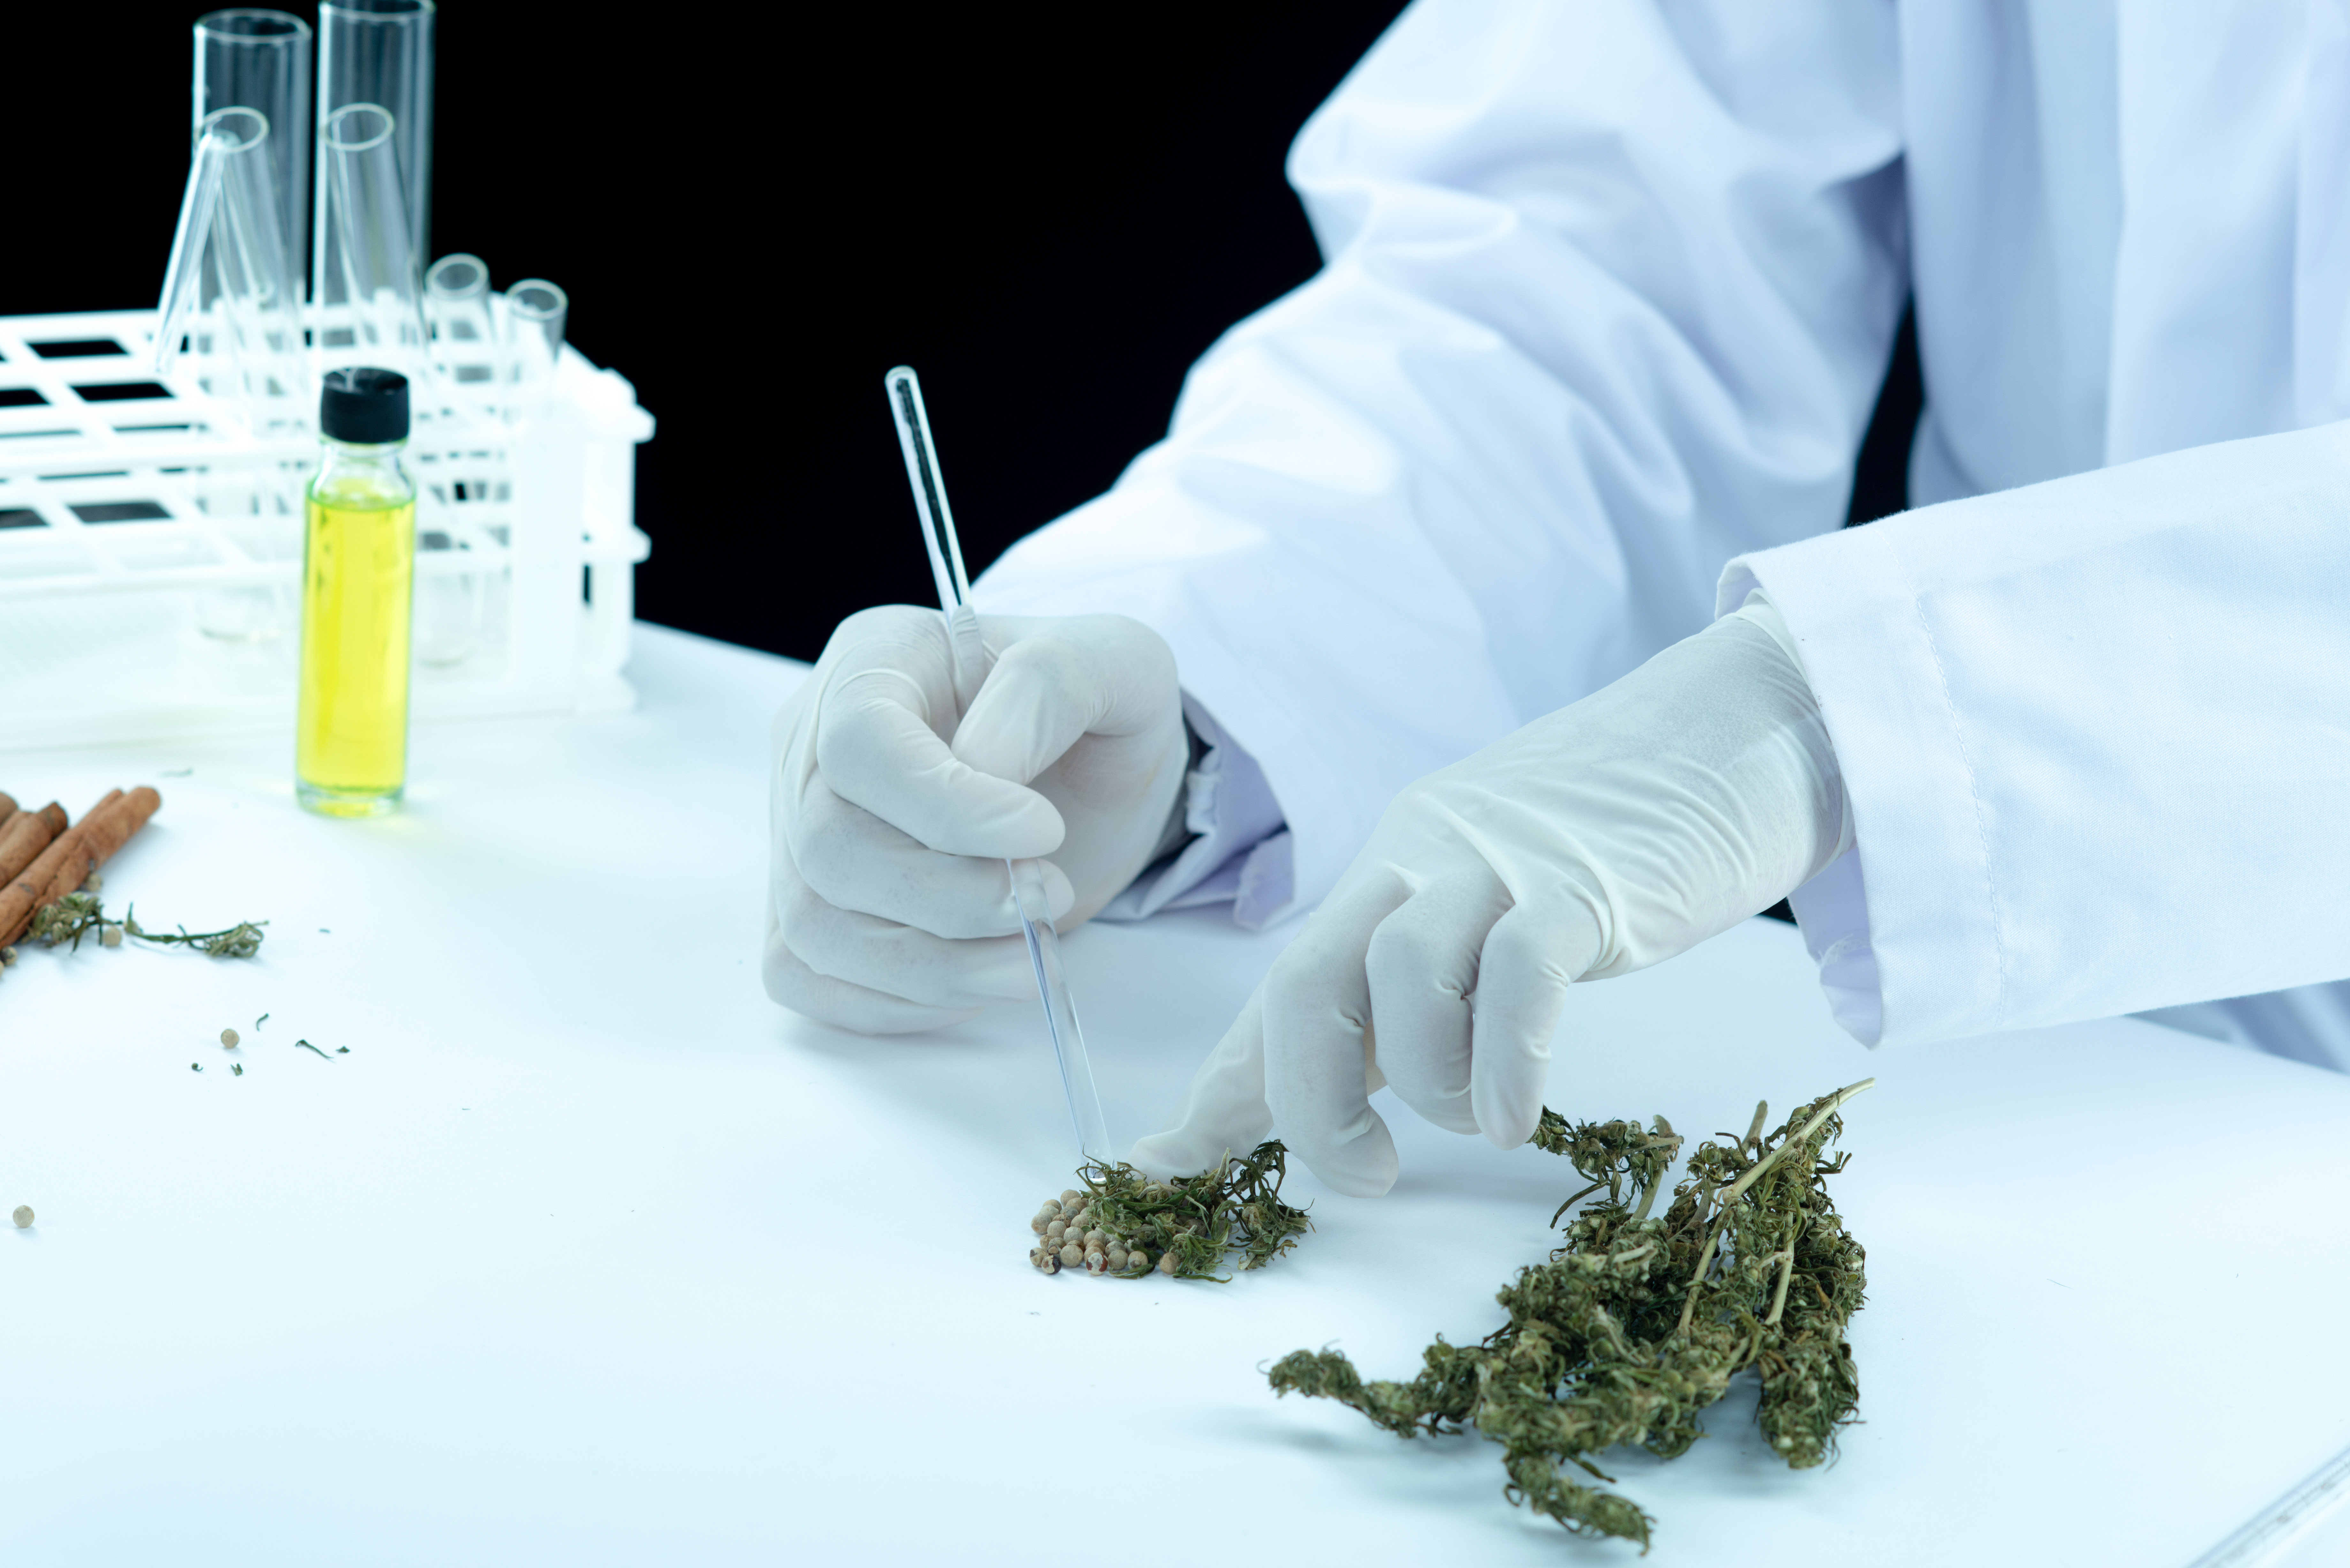 Lab tech with CBD and marijuana flowers.